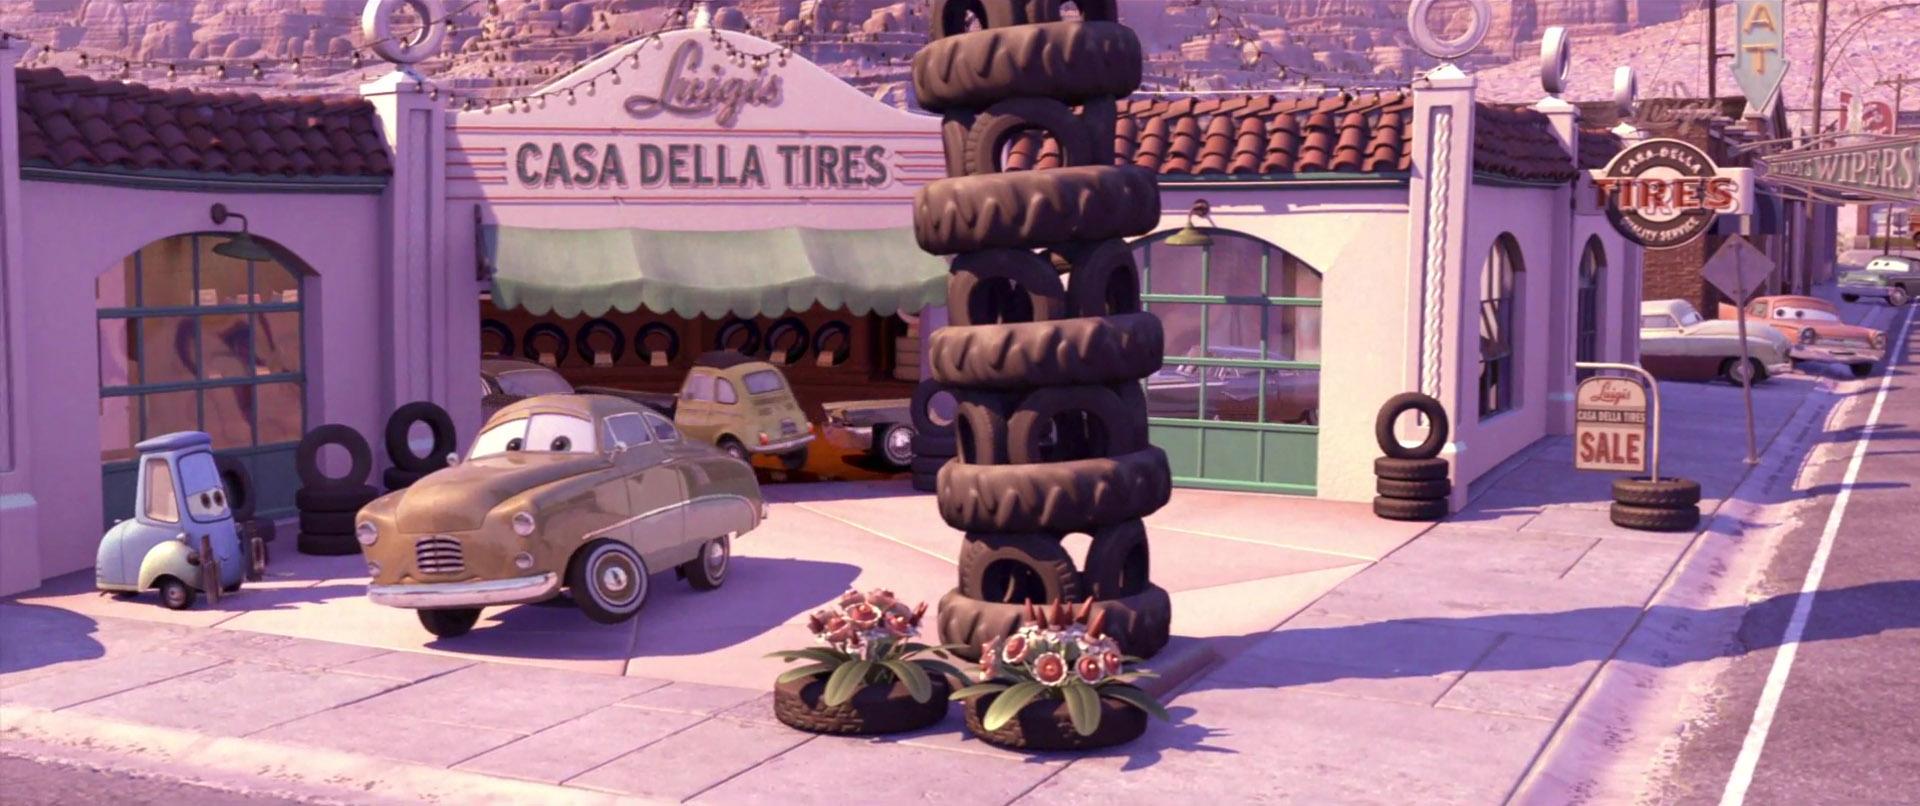 mildred bylane personnage character pixar disney cars